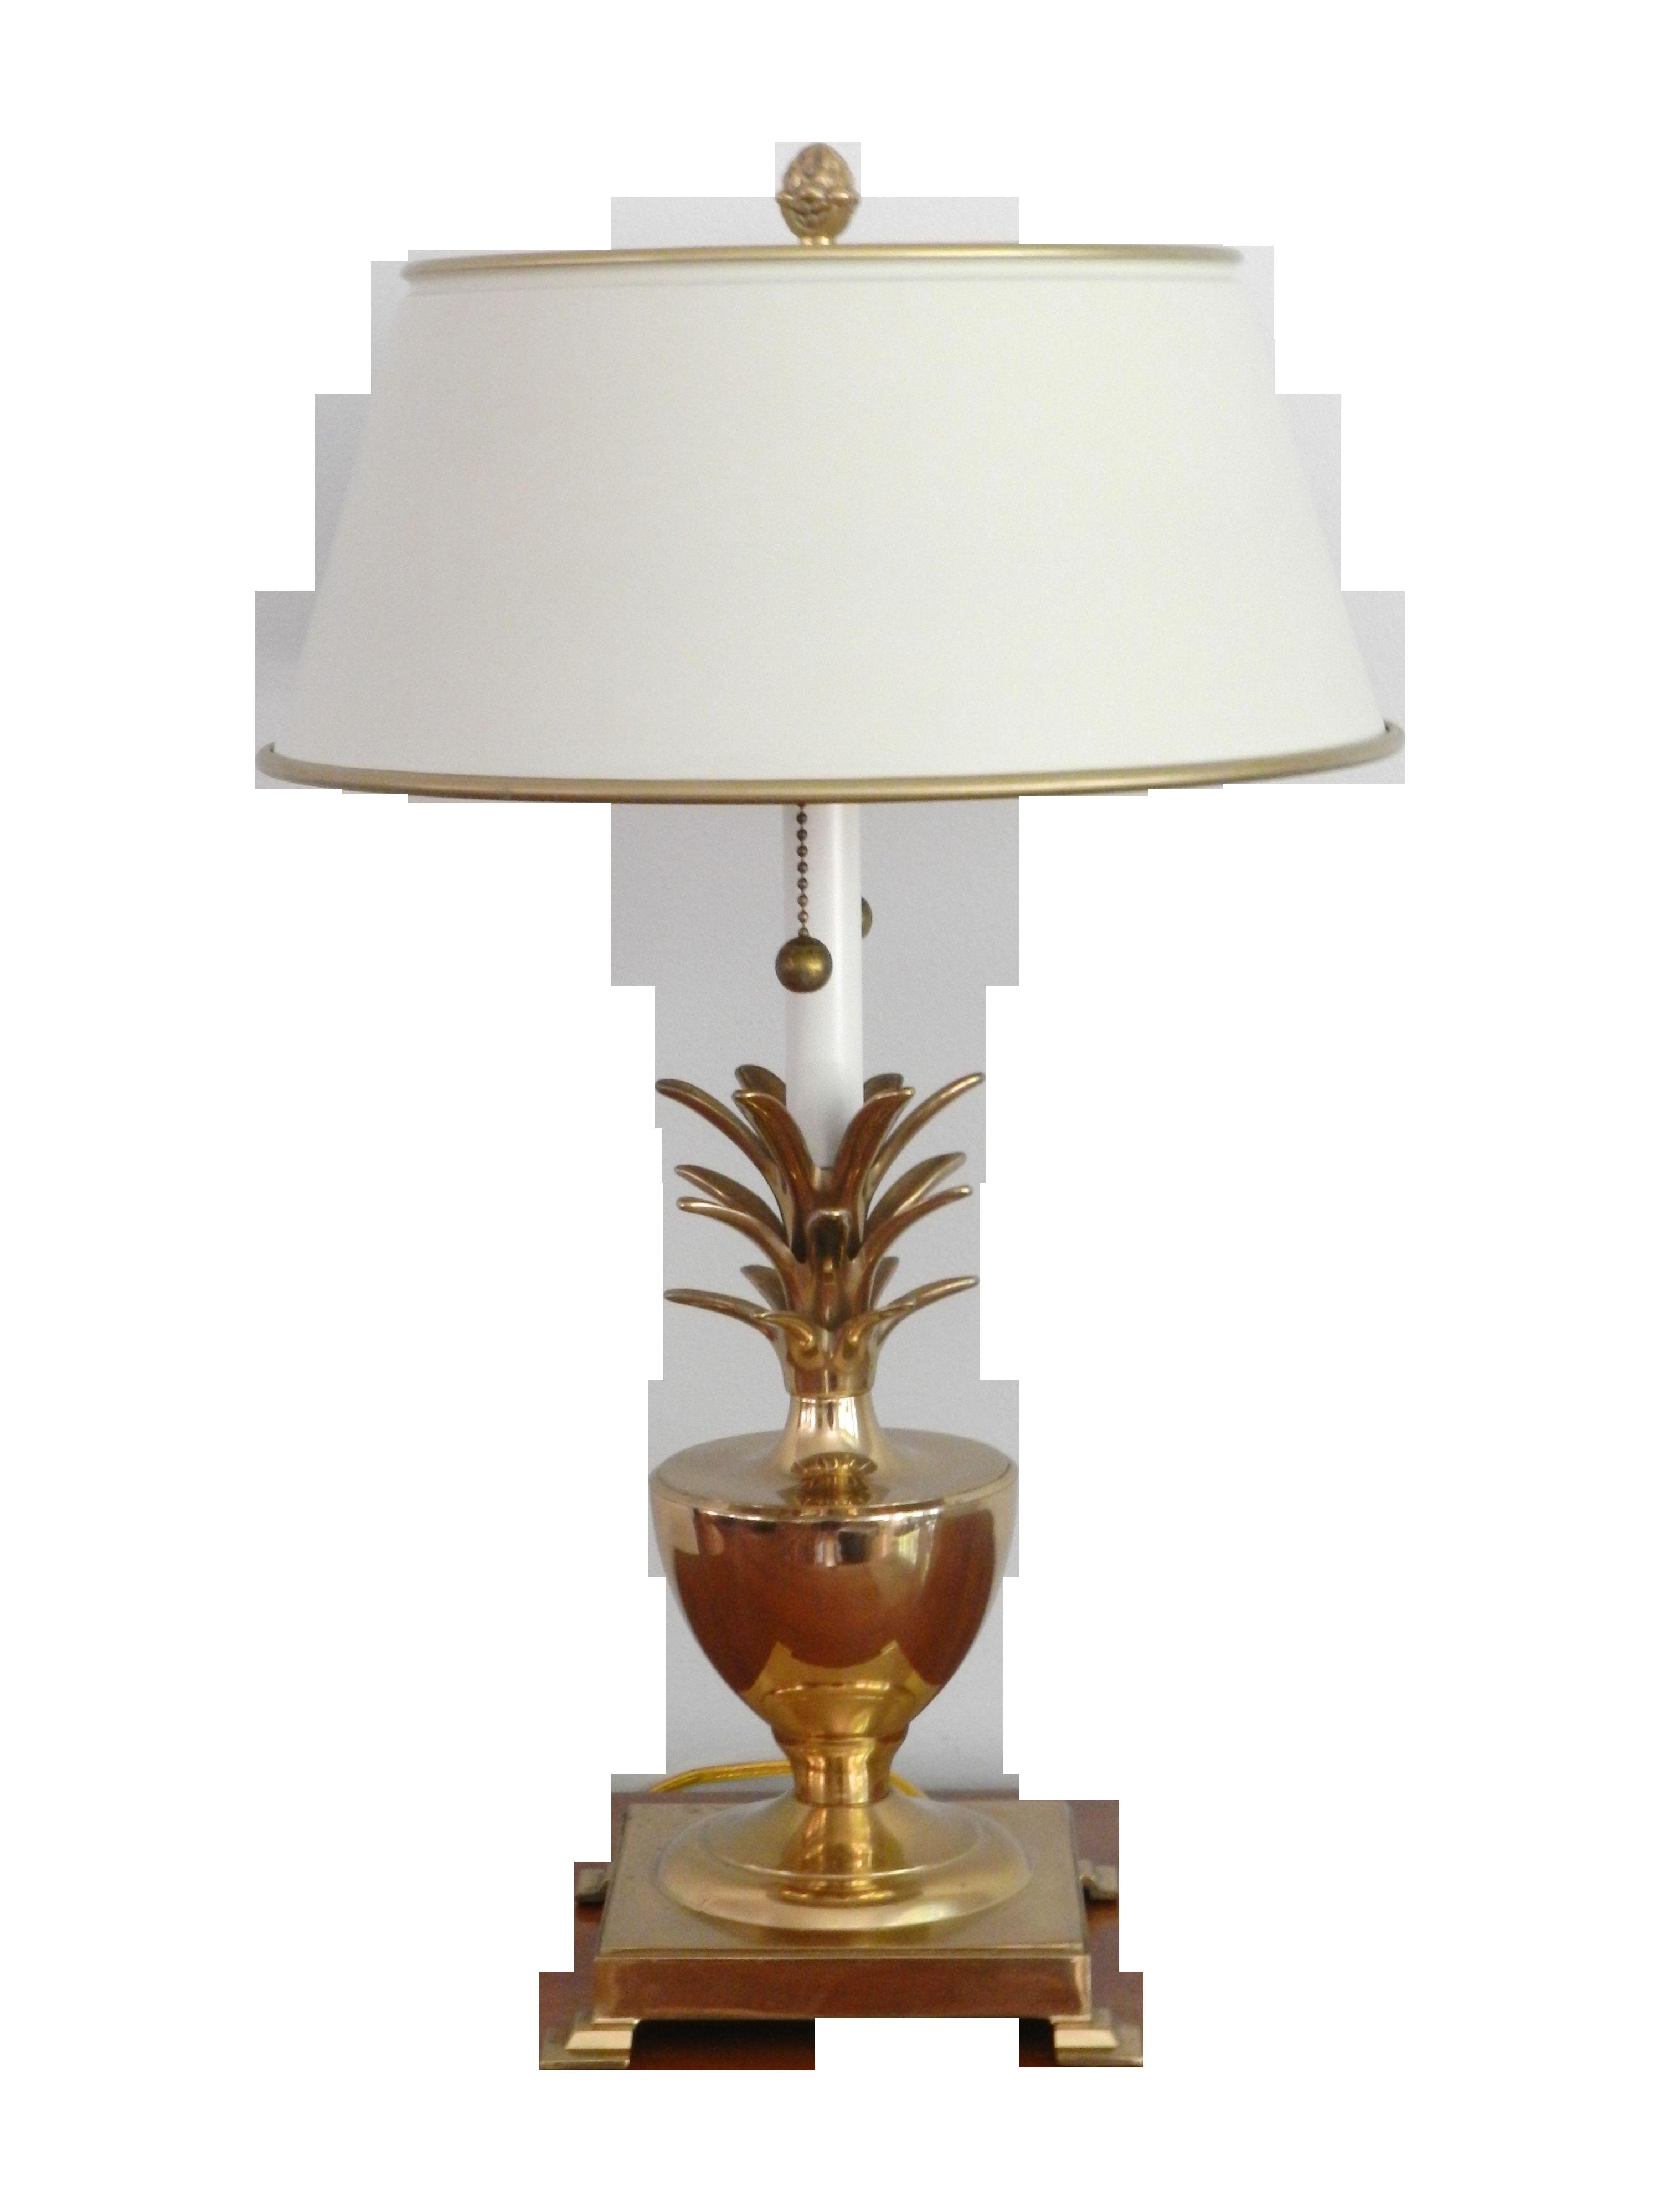 Brass Pineapple Table Lamp Vintage Brass Pineapple Table Lamp | Chairish